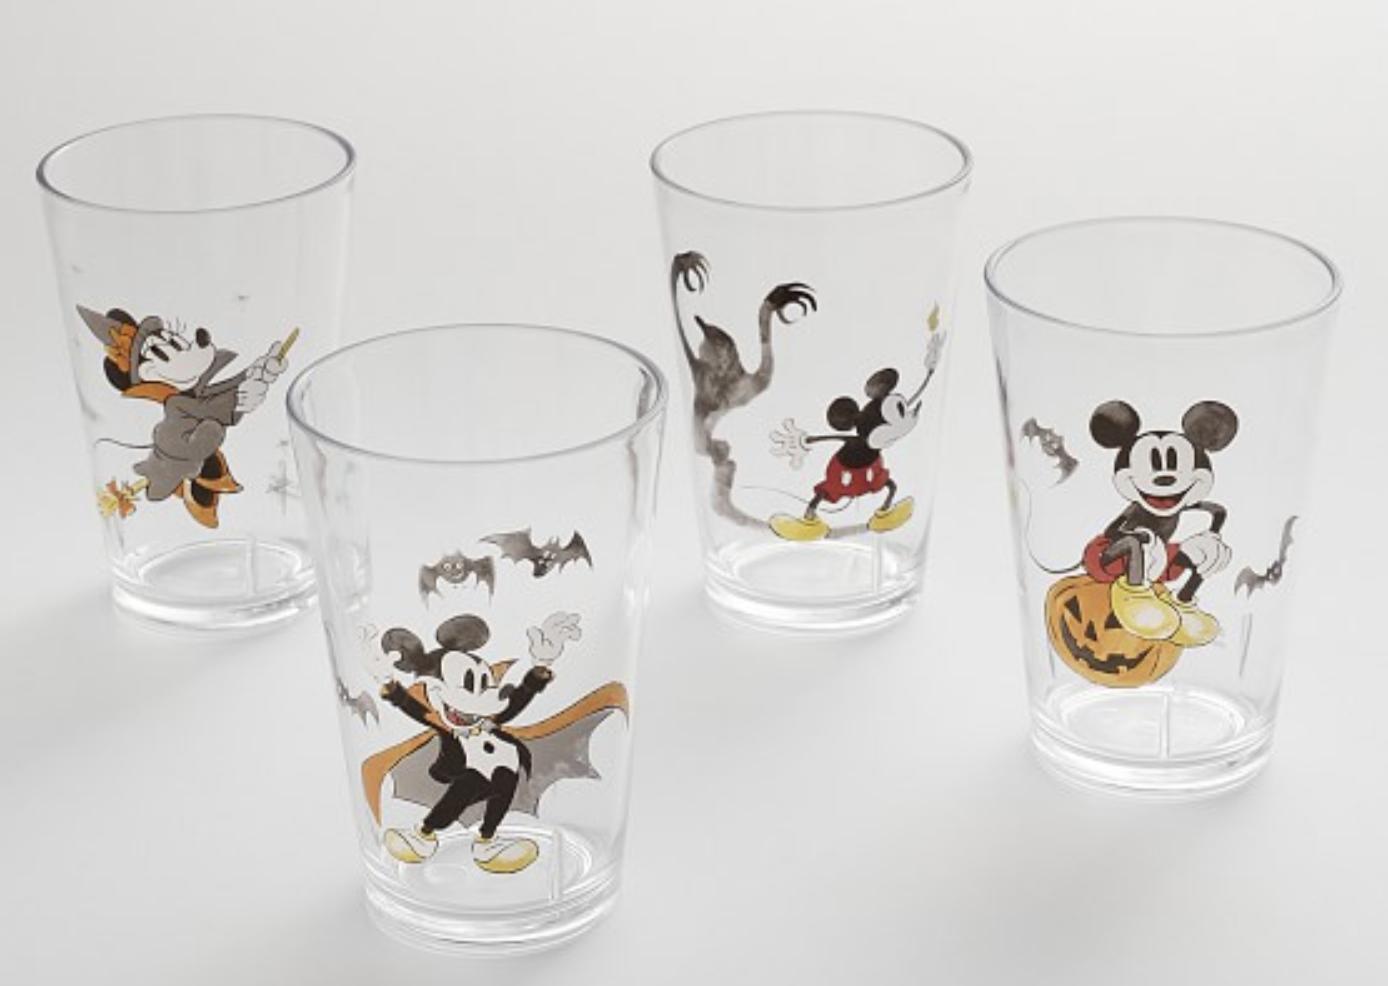 Halloween 2020 Pint Glass Amc Pottery Barn Kids Launches Halloween Themed Disney Collection